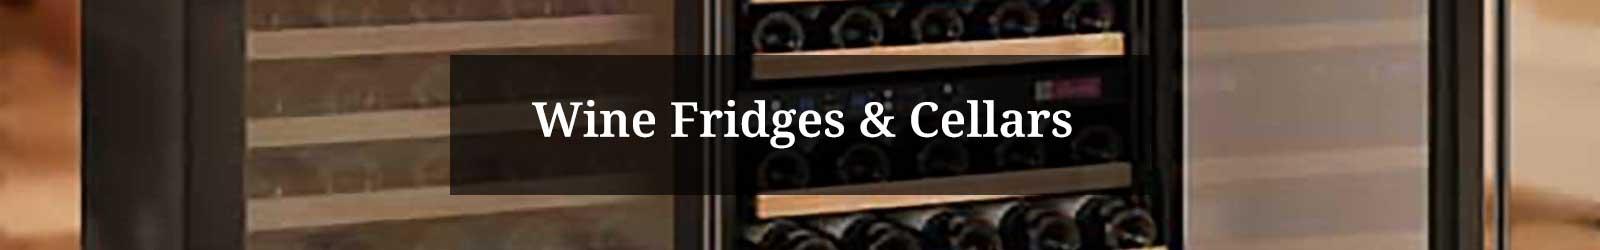 Wine Fridges and Cellars